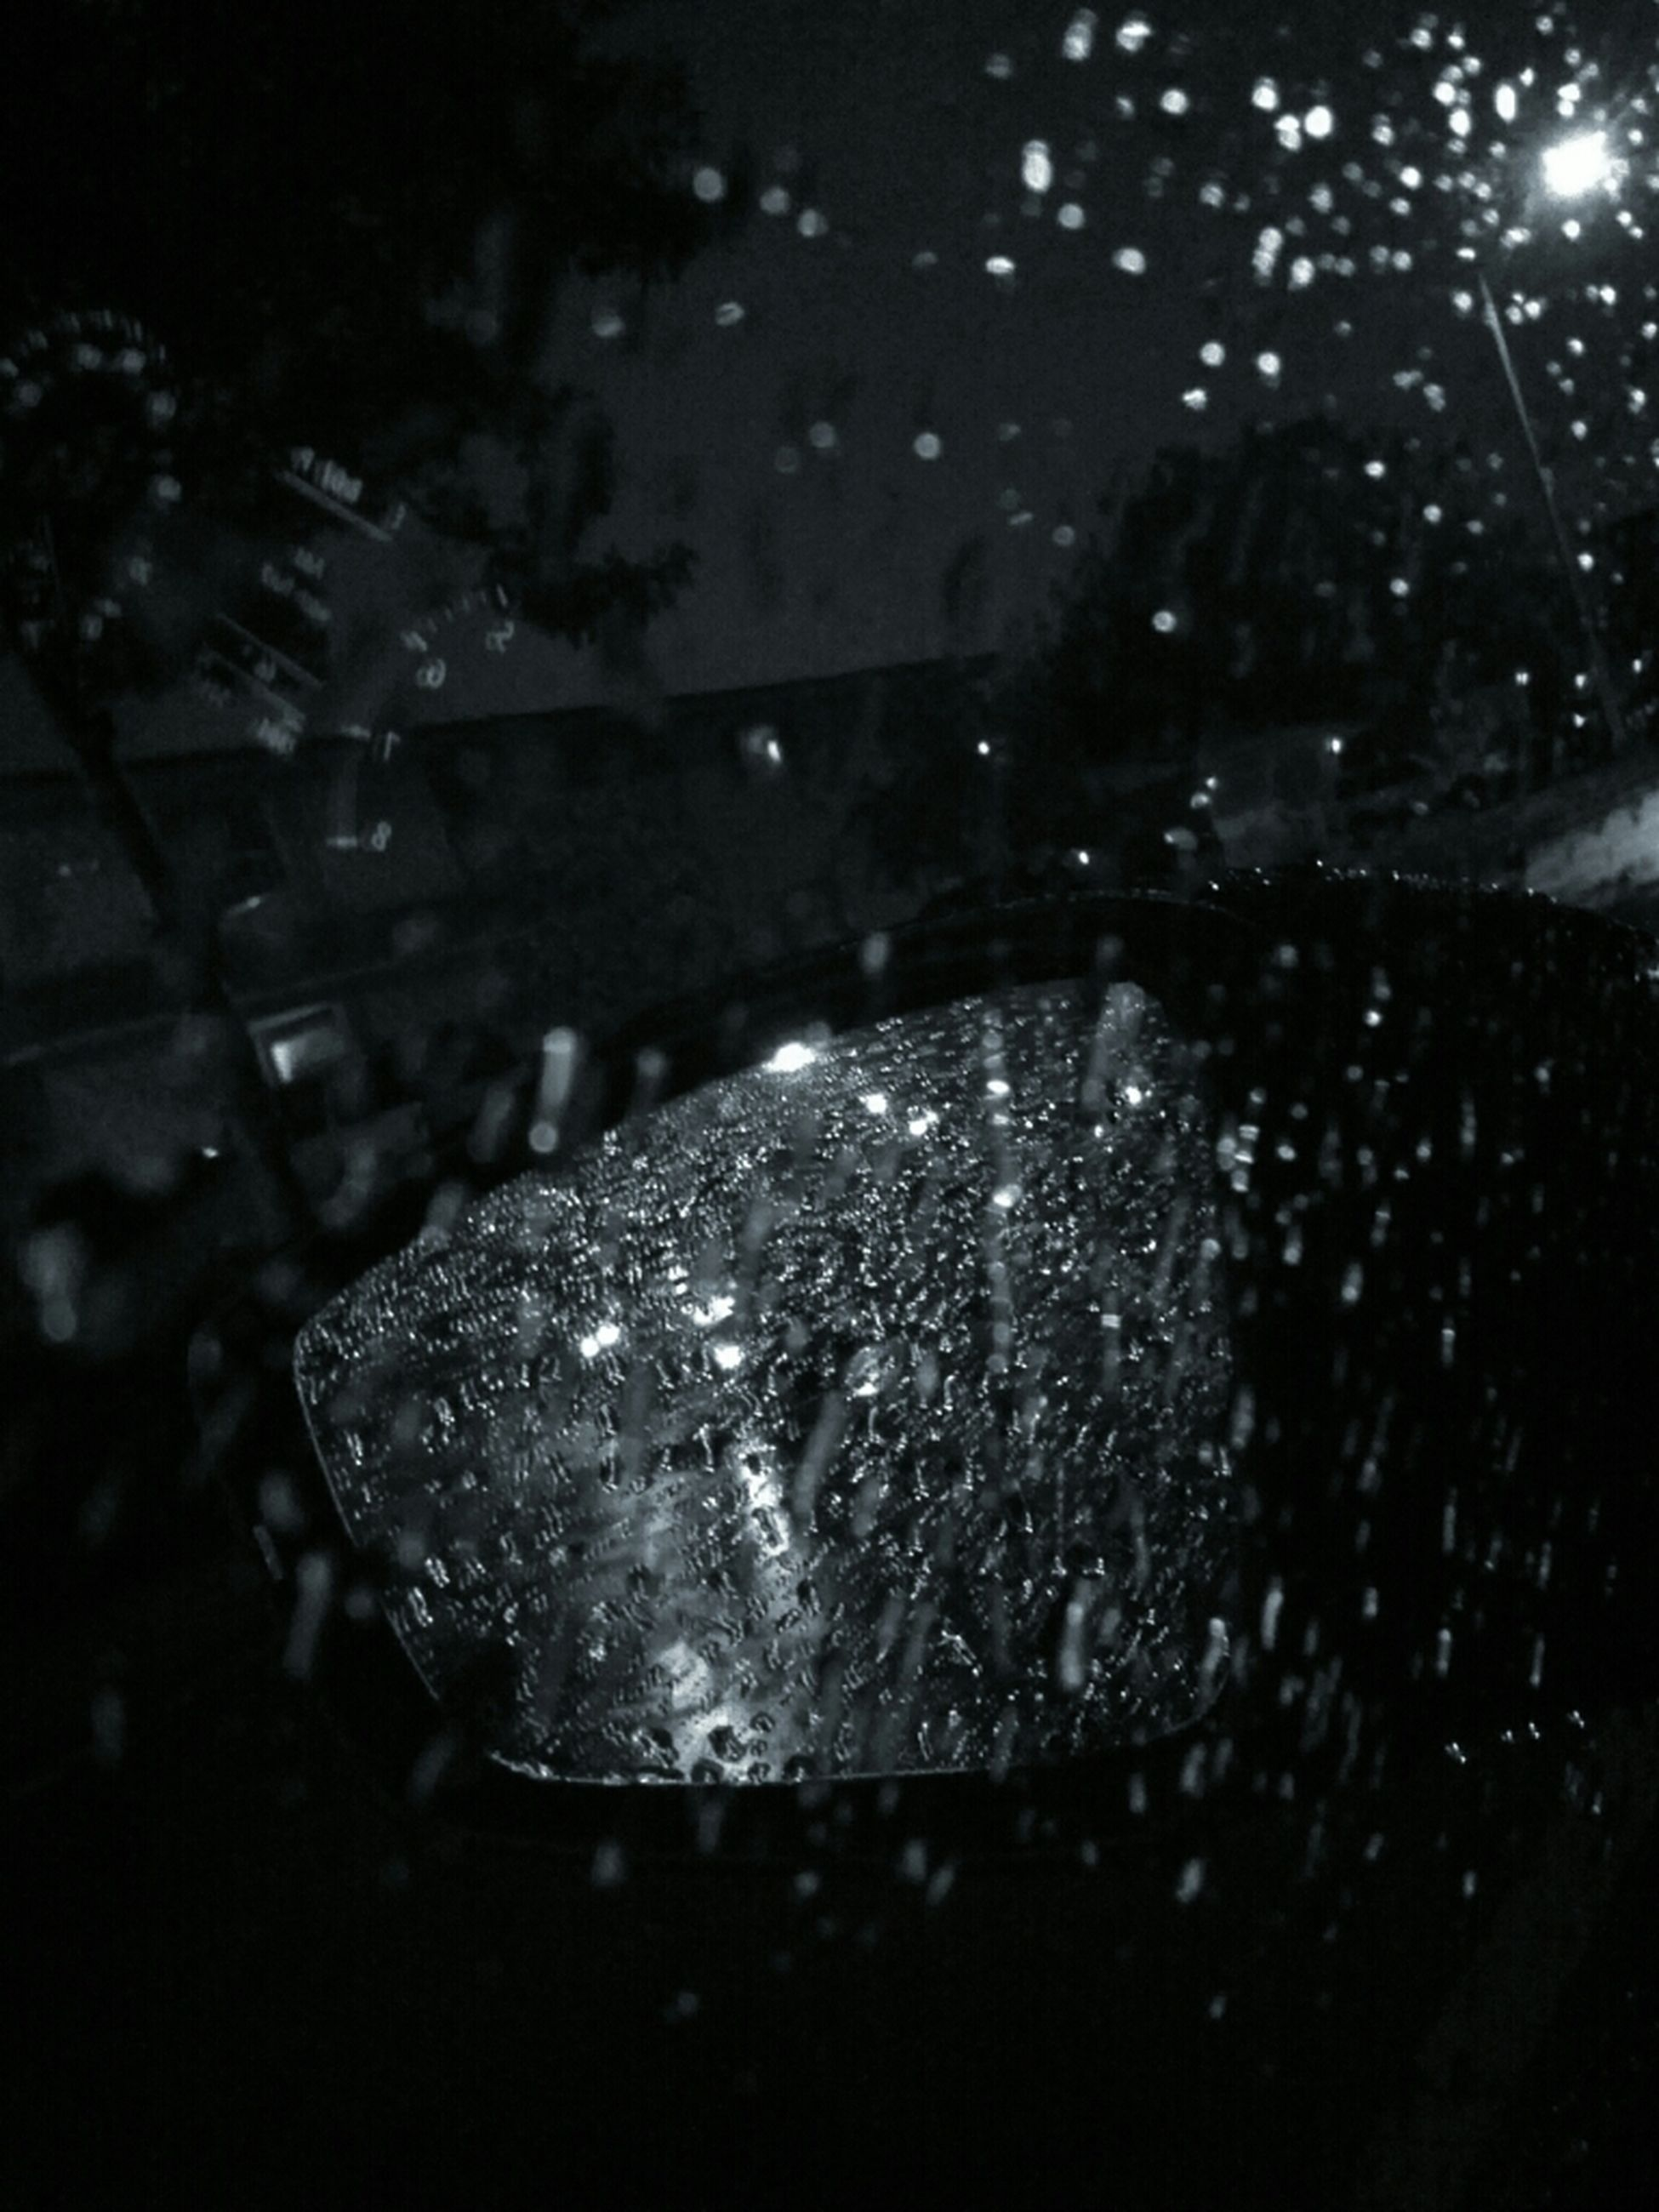 night, water, drop, wet, close-up, rain, illuminated, season, focus on foreground, dark, raindrop, selective focus, nature, indoors, weather, no people, monsoon, reflection, high angle view